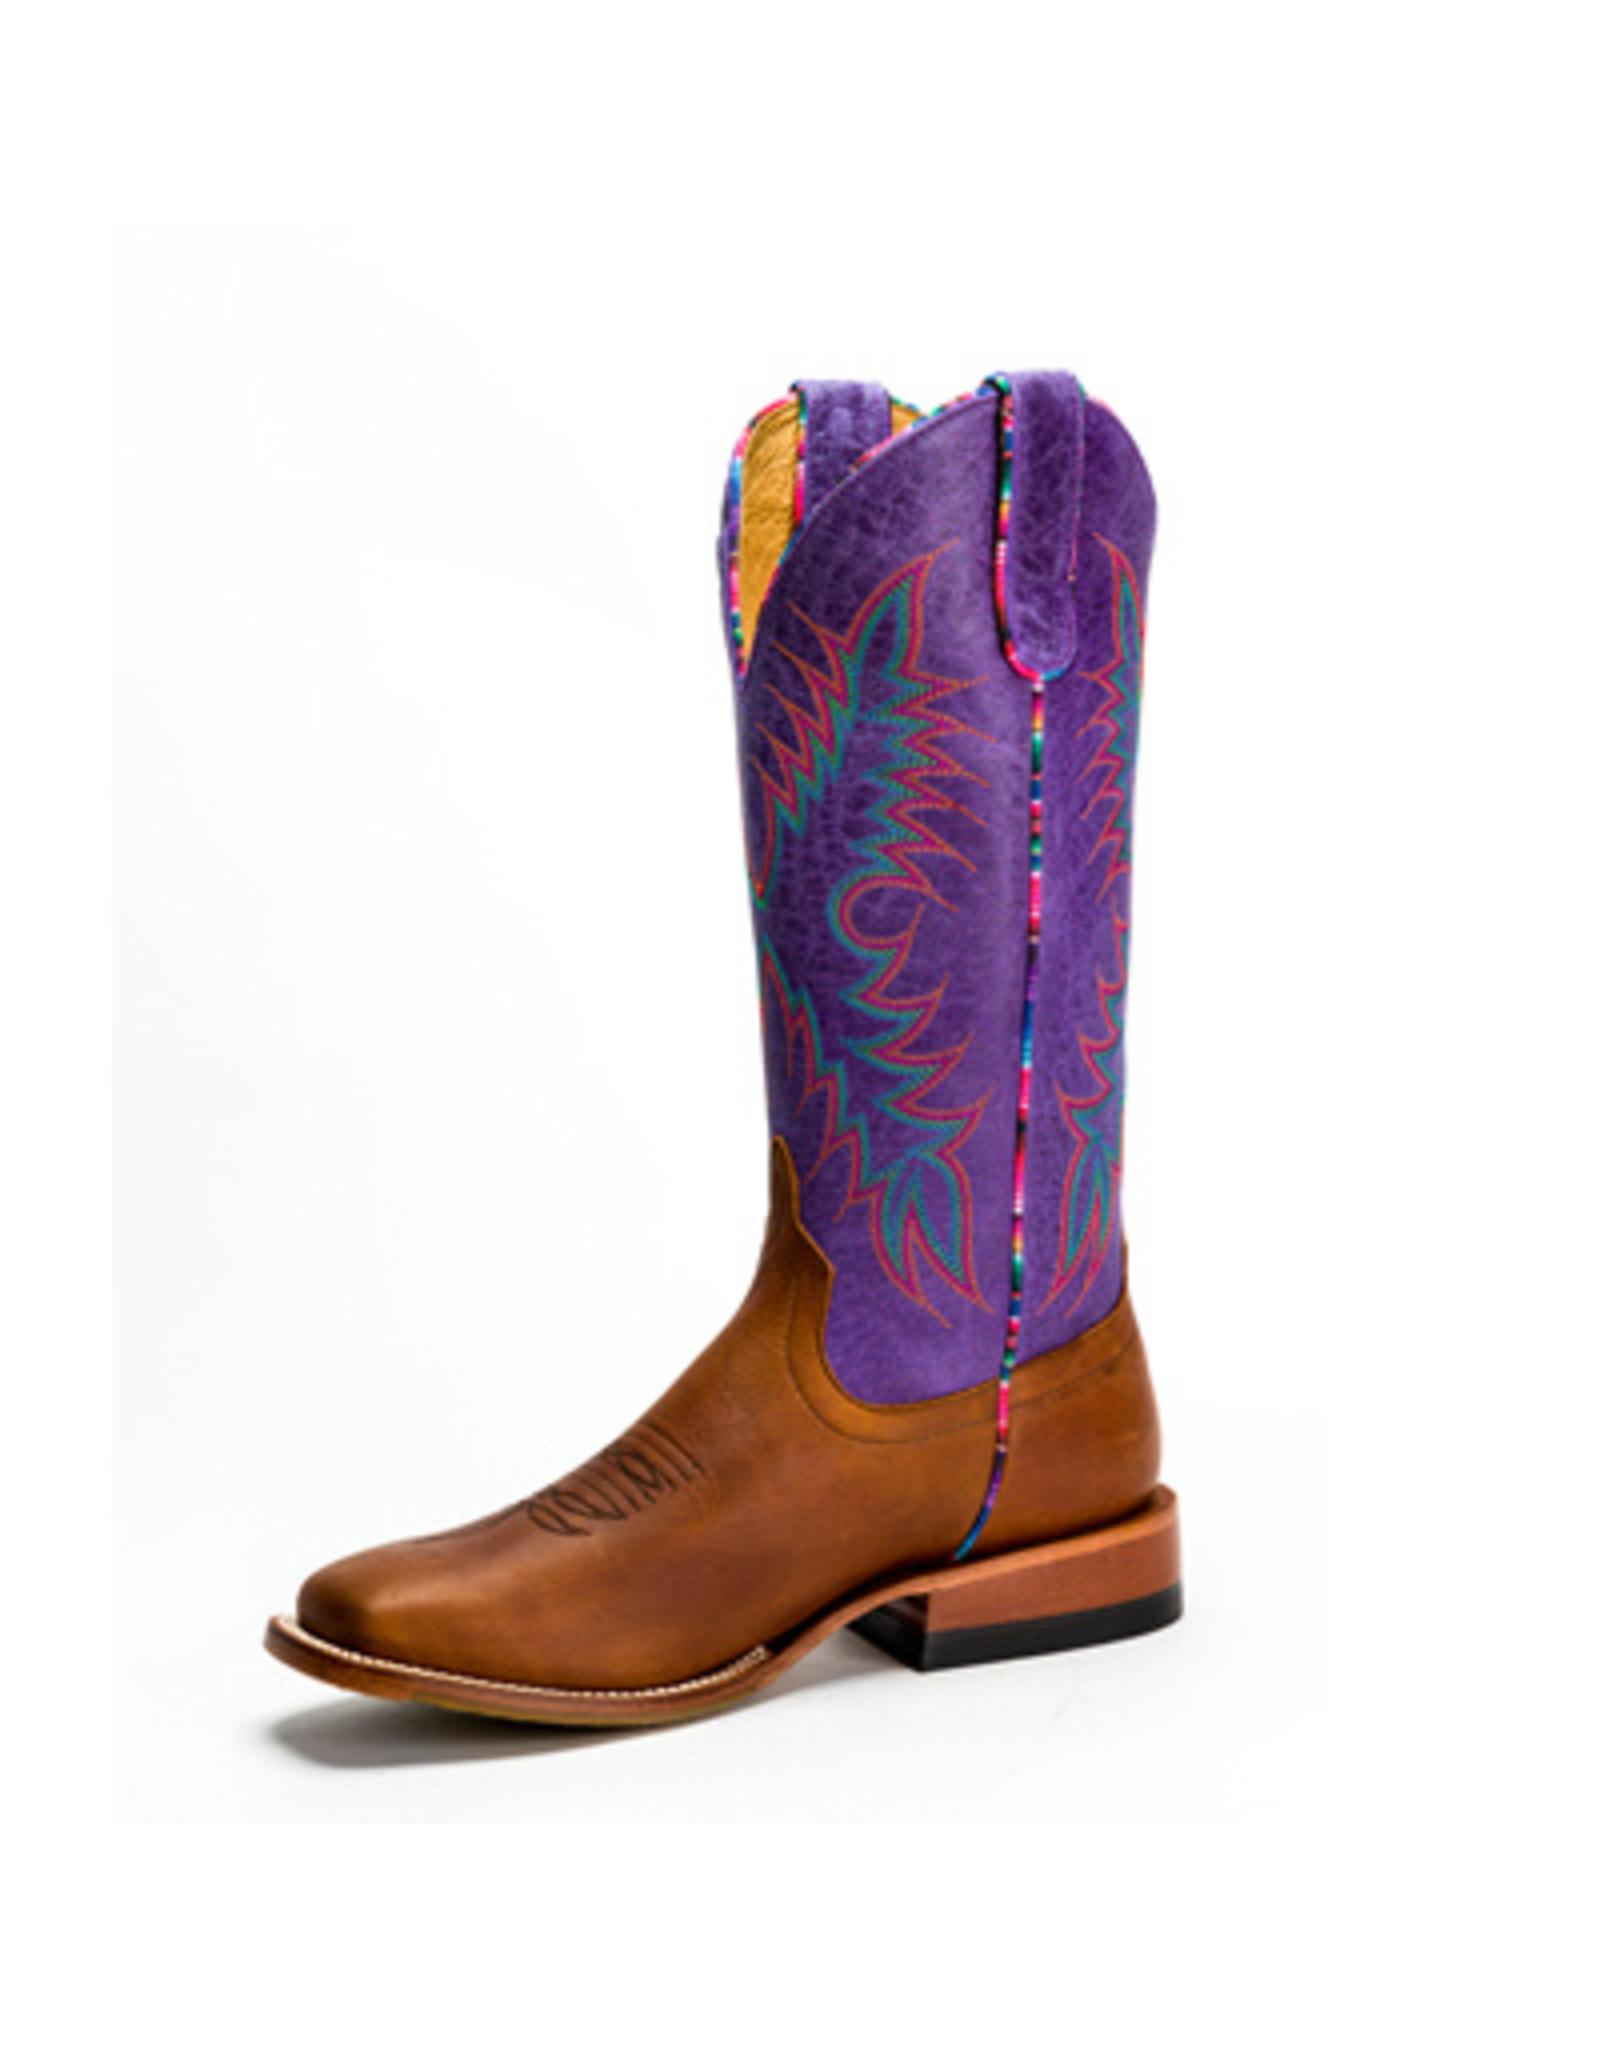 Boots-Women MACIE BEAN M9161